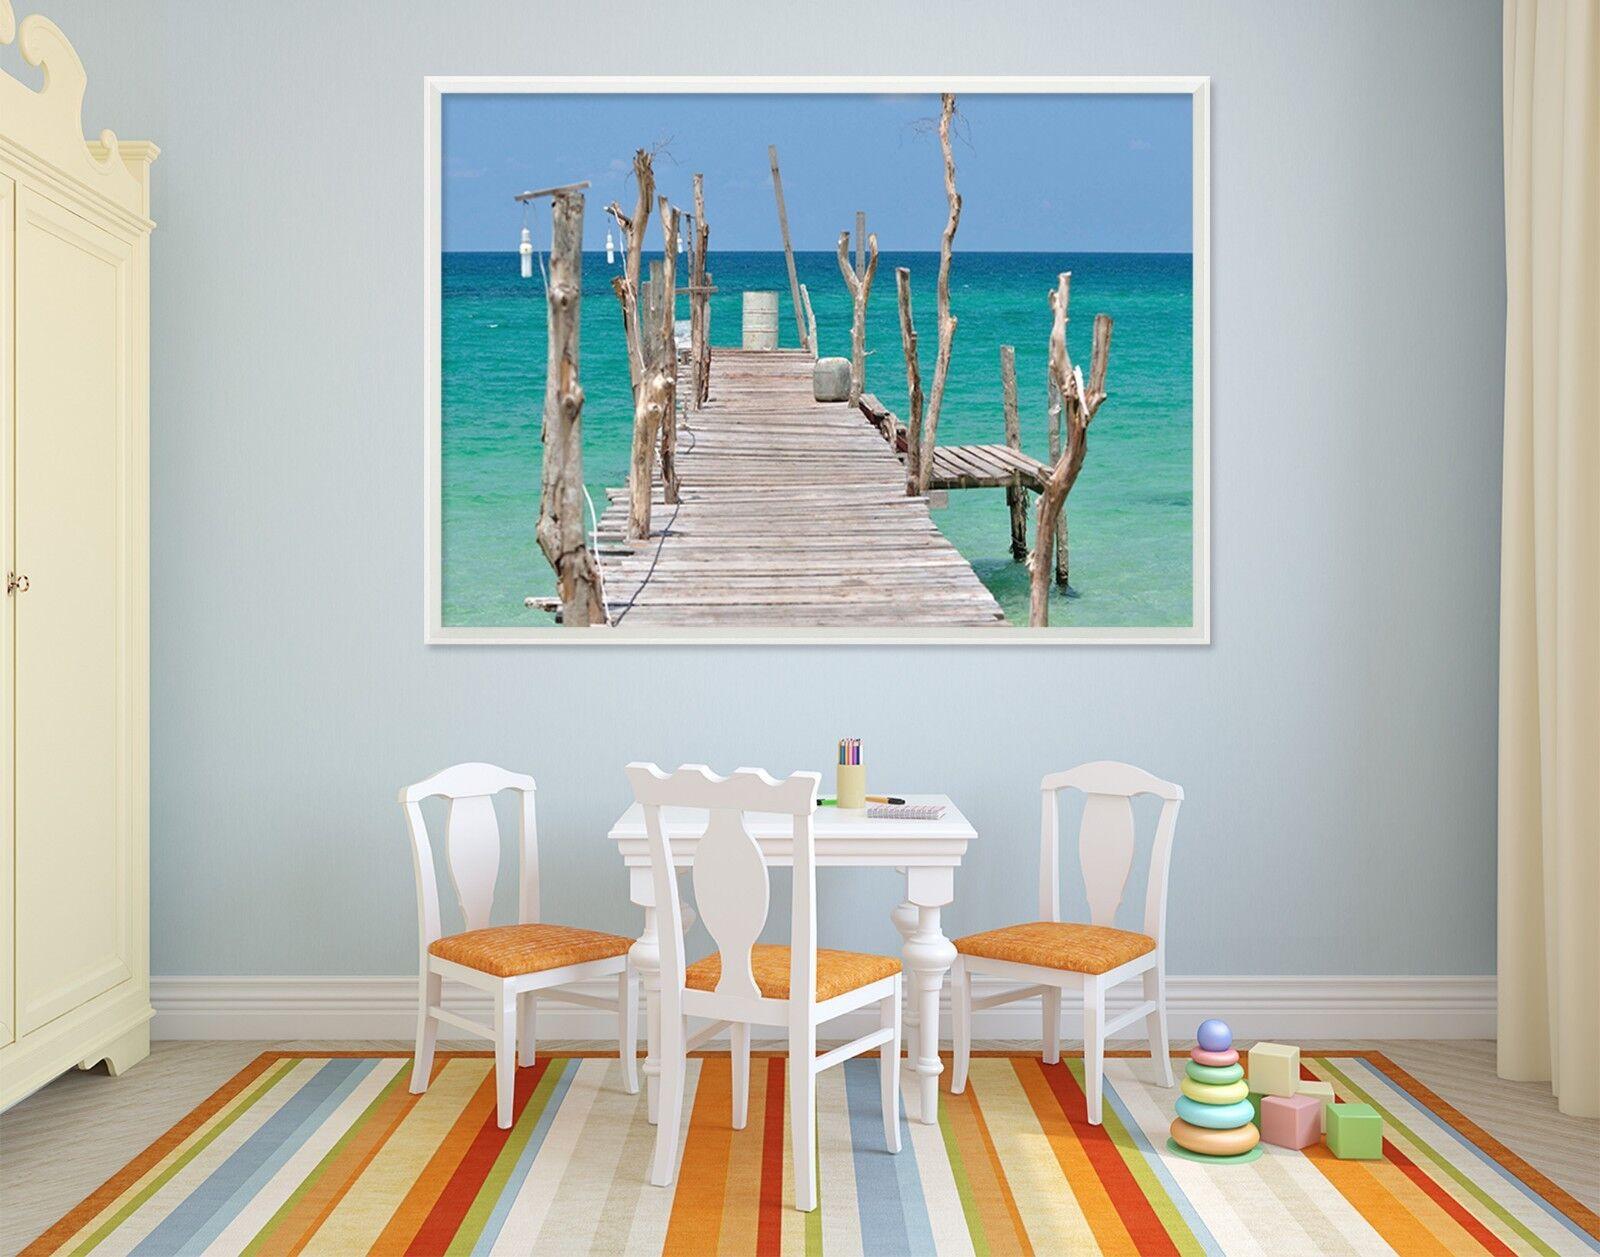 3D Wood Seaview 6 Framed Poster Home Decor Print Painting Art AJ WALLPAPER